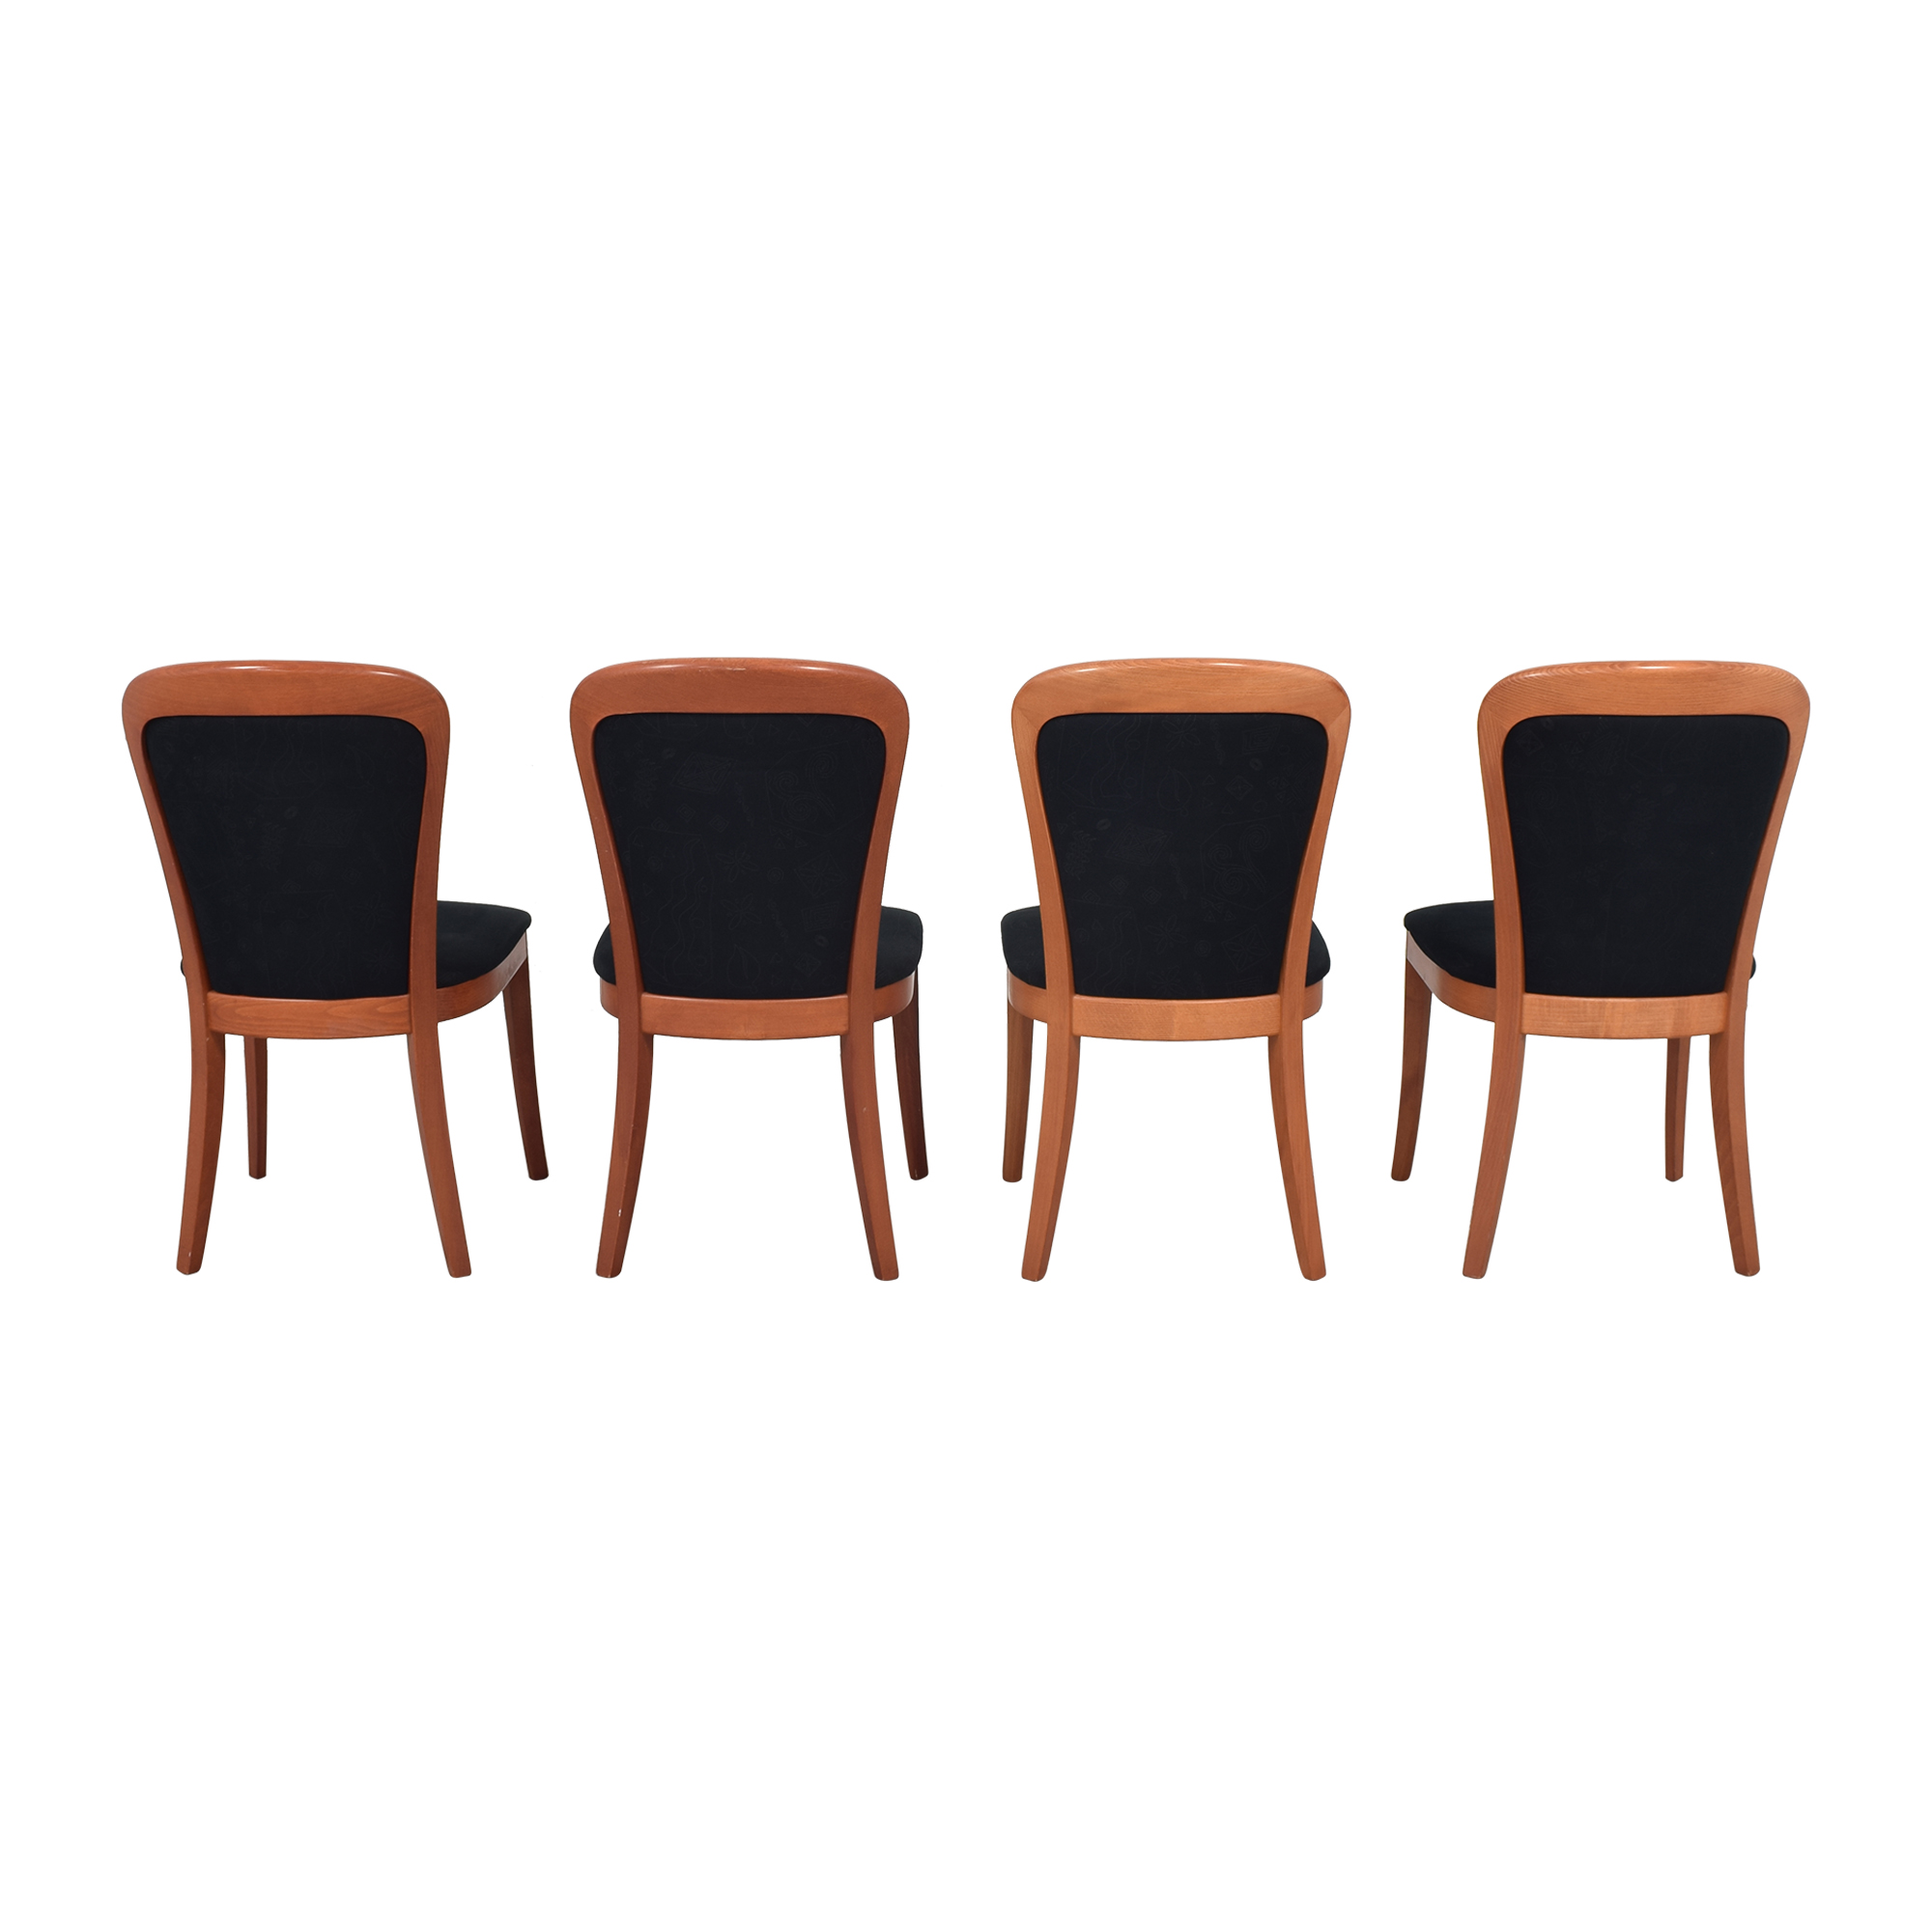 SA A. Sibau SA A. Sibau Dining Chairs used